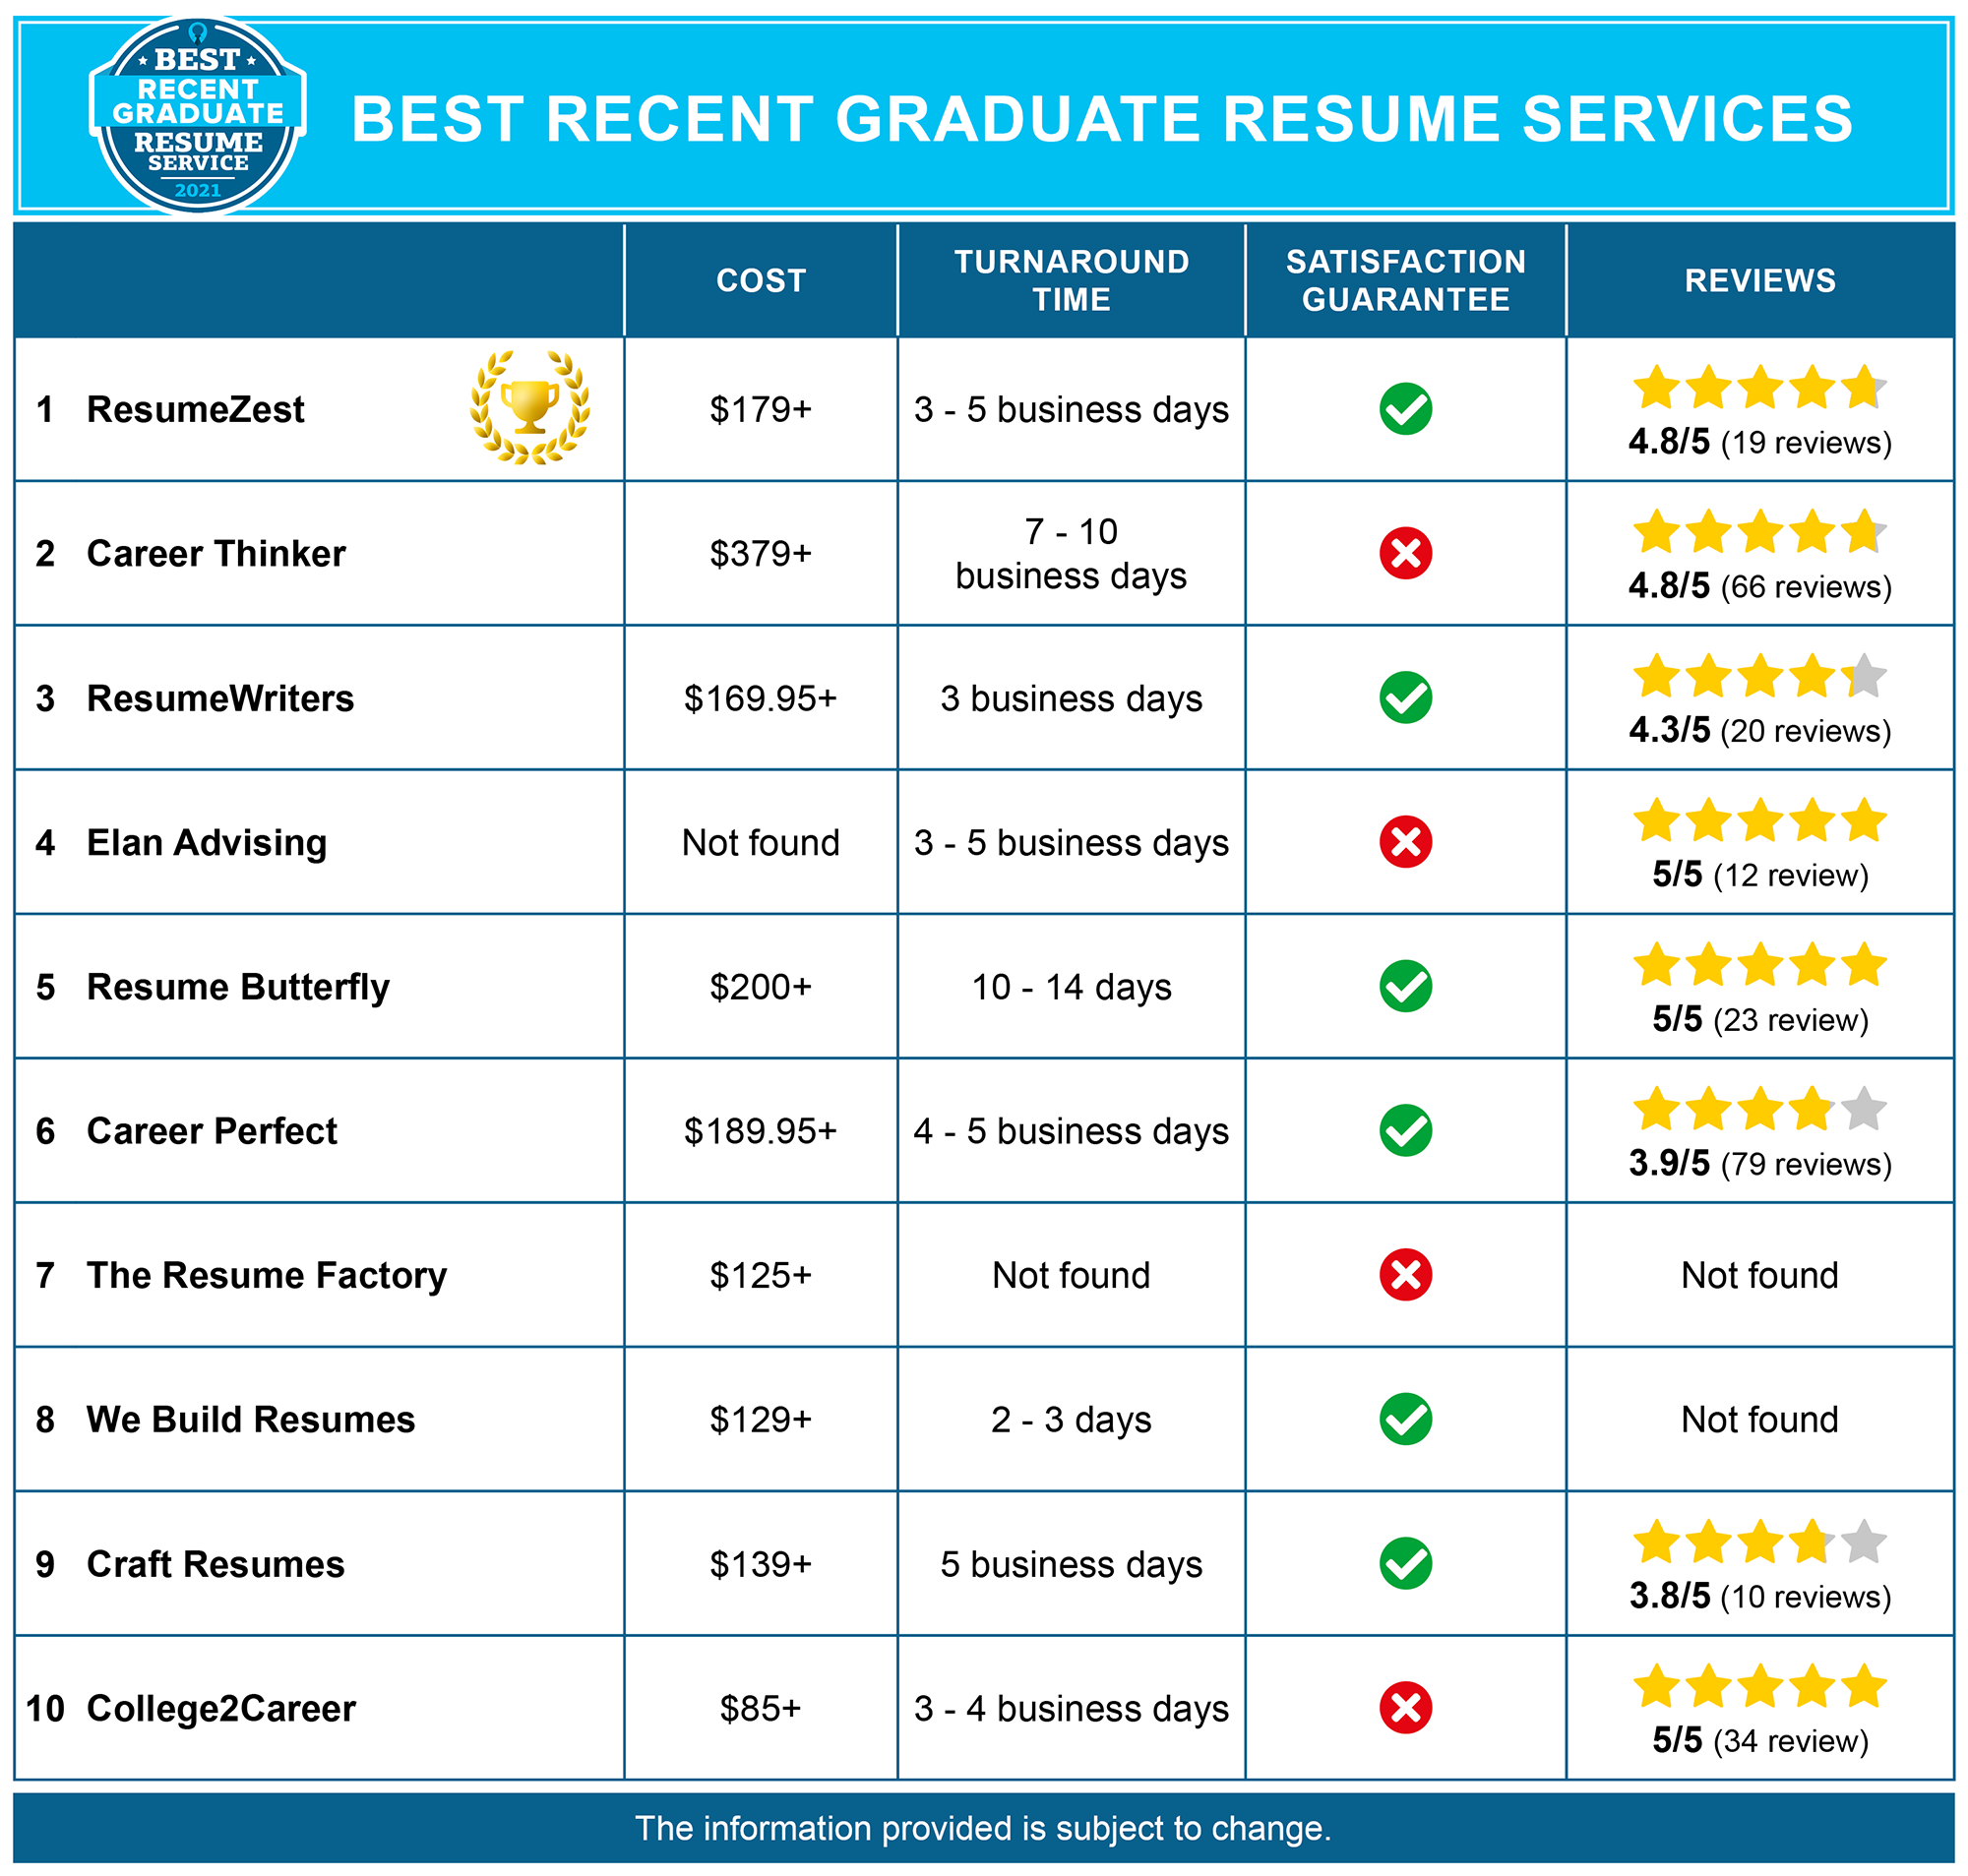 Best Recent Graduate Resume Services